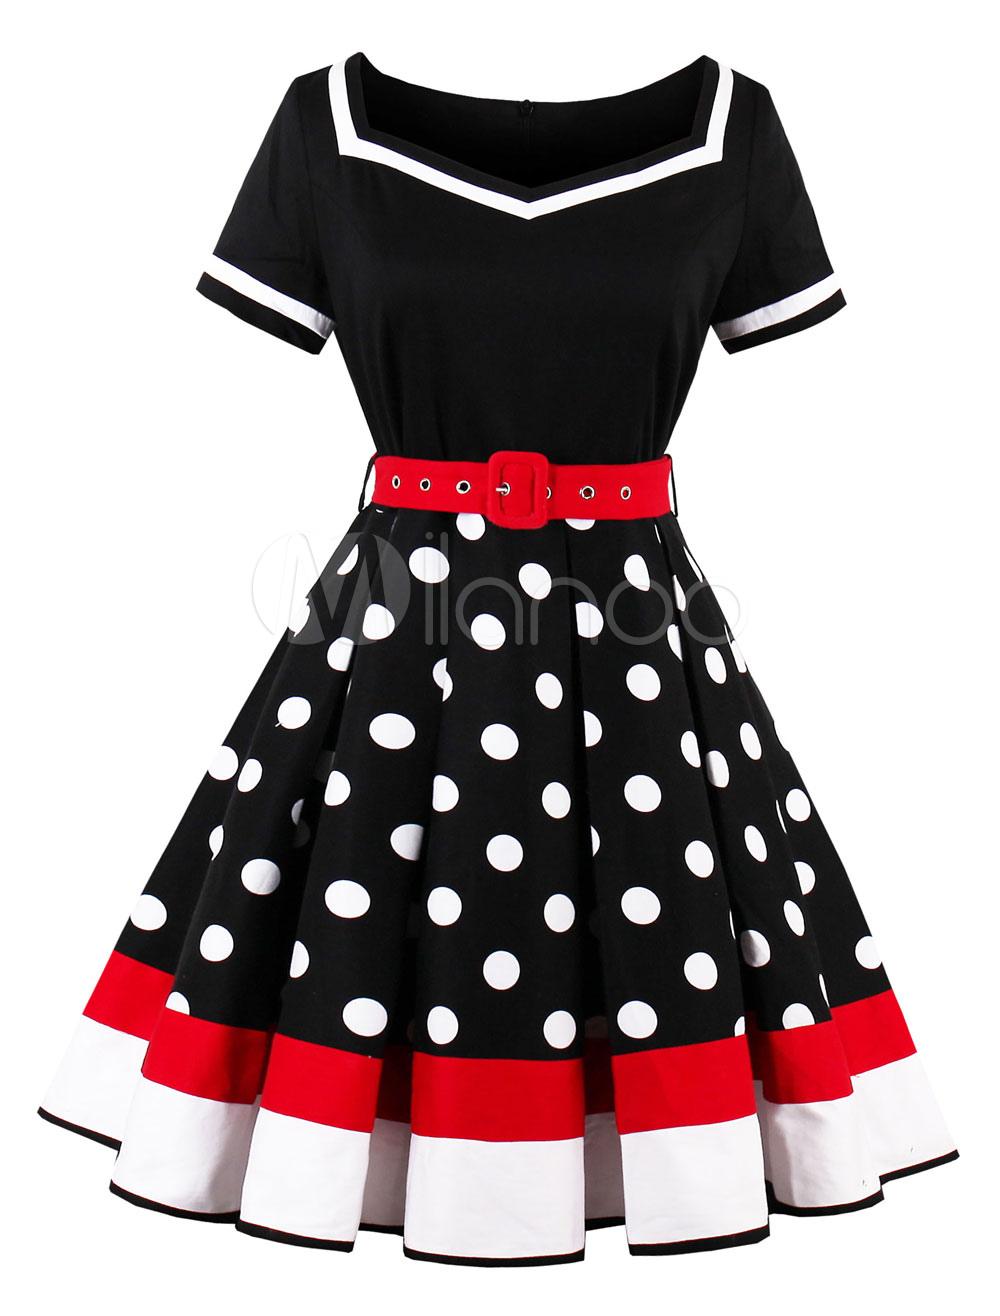 Black Vintage Dress Short Sleeve Polka Dot Print Women Swing Dresses (Women\\'s Clothing Vintage Dresses) photo